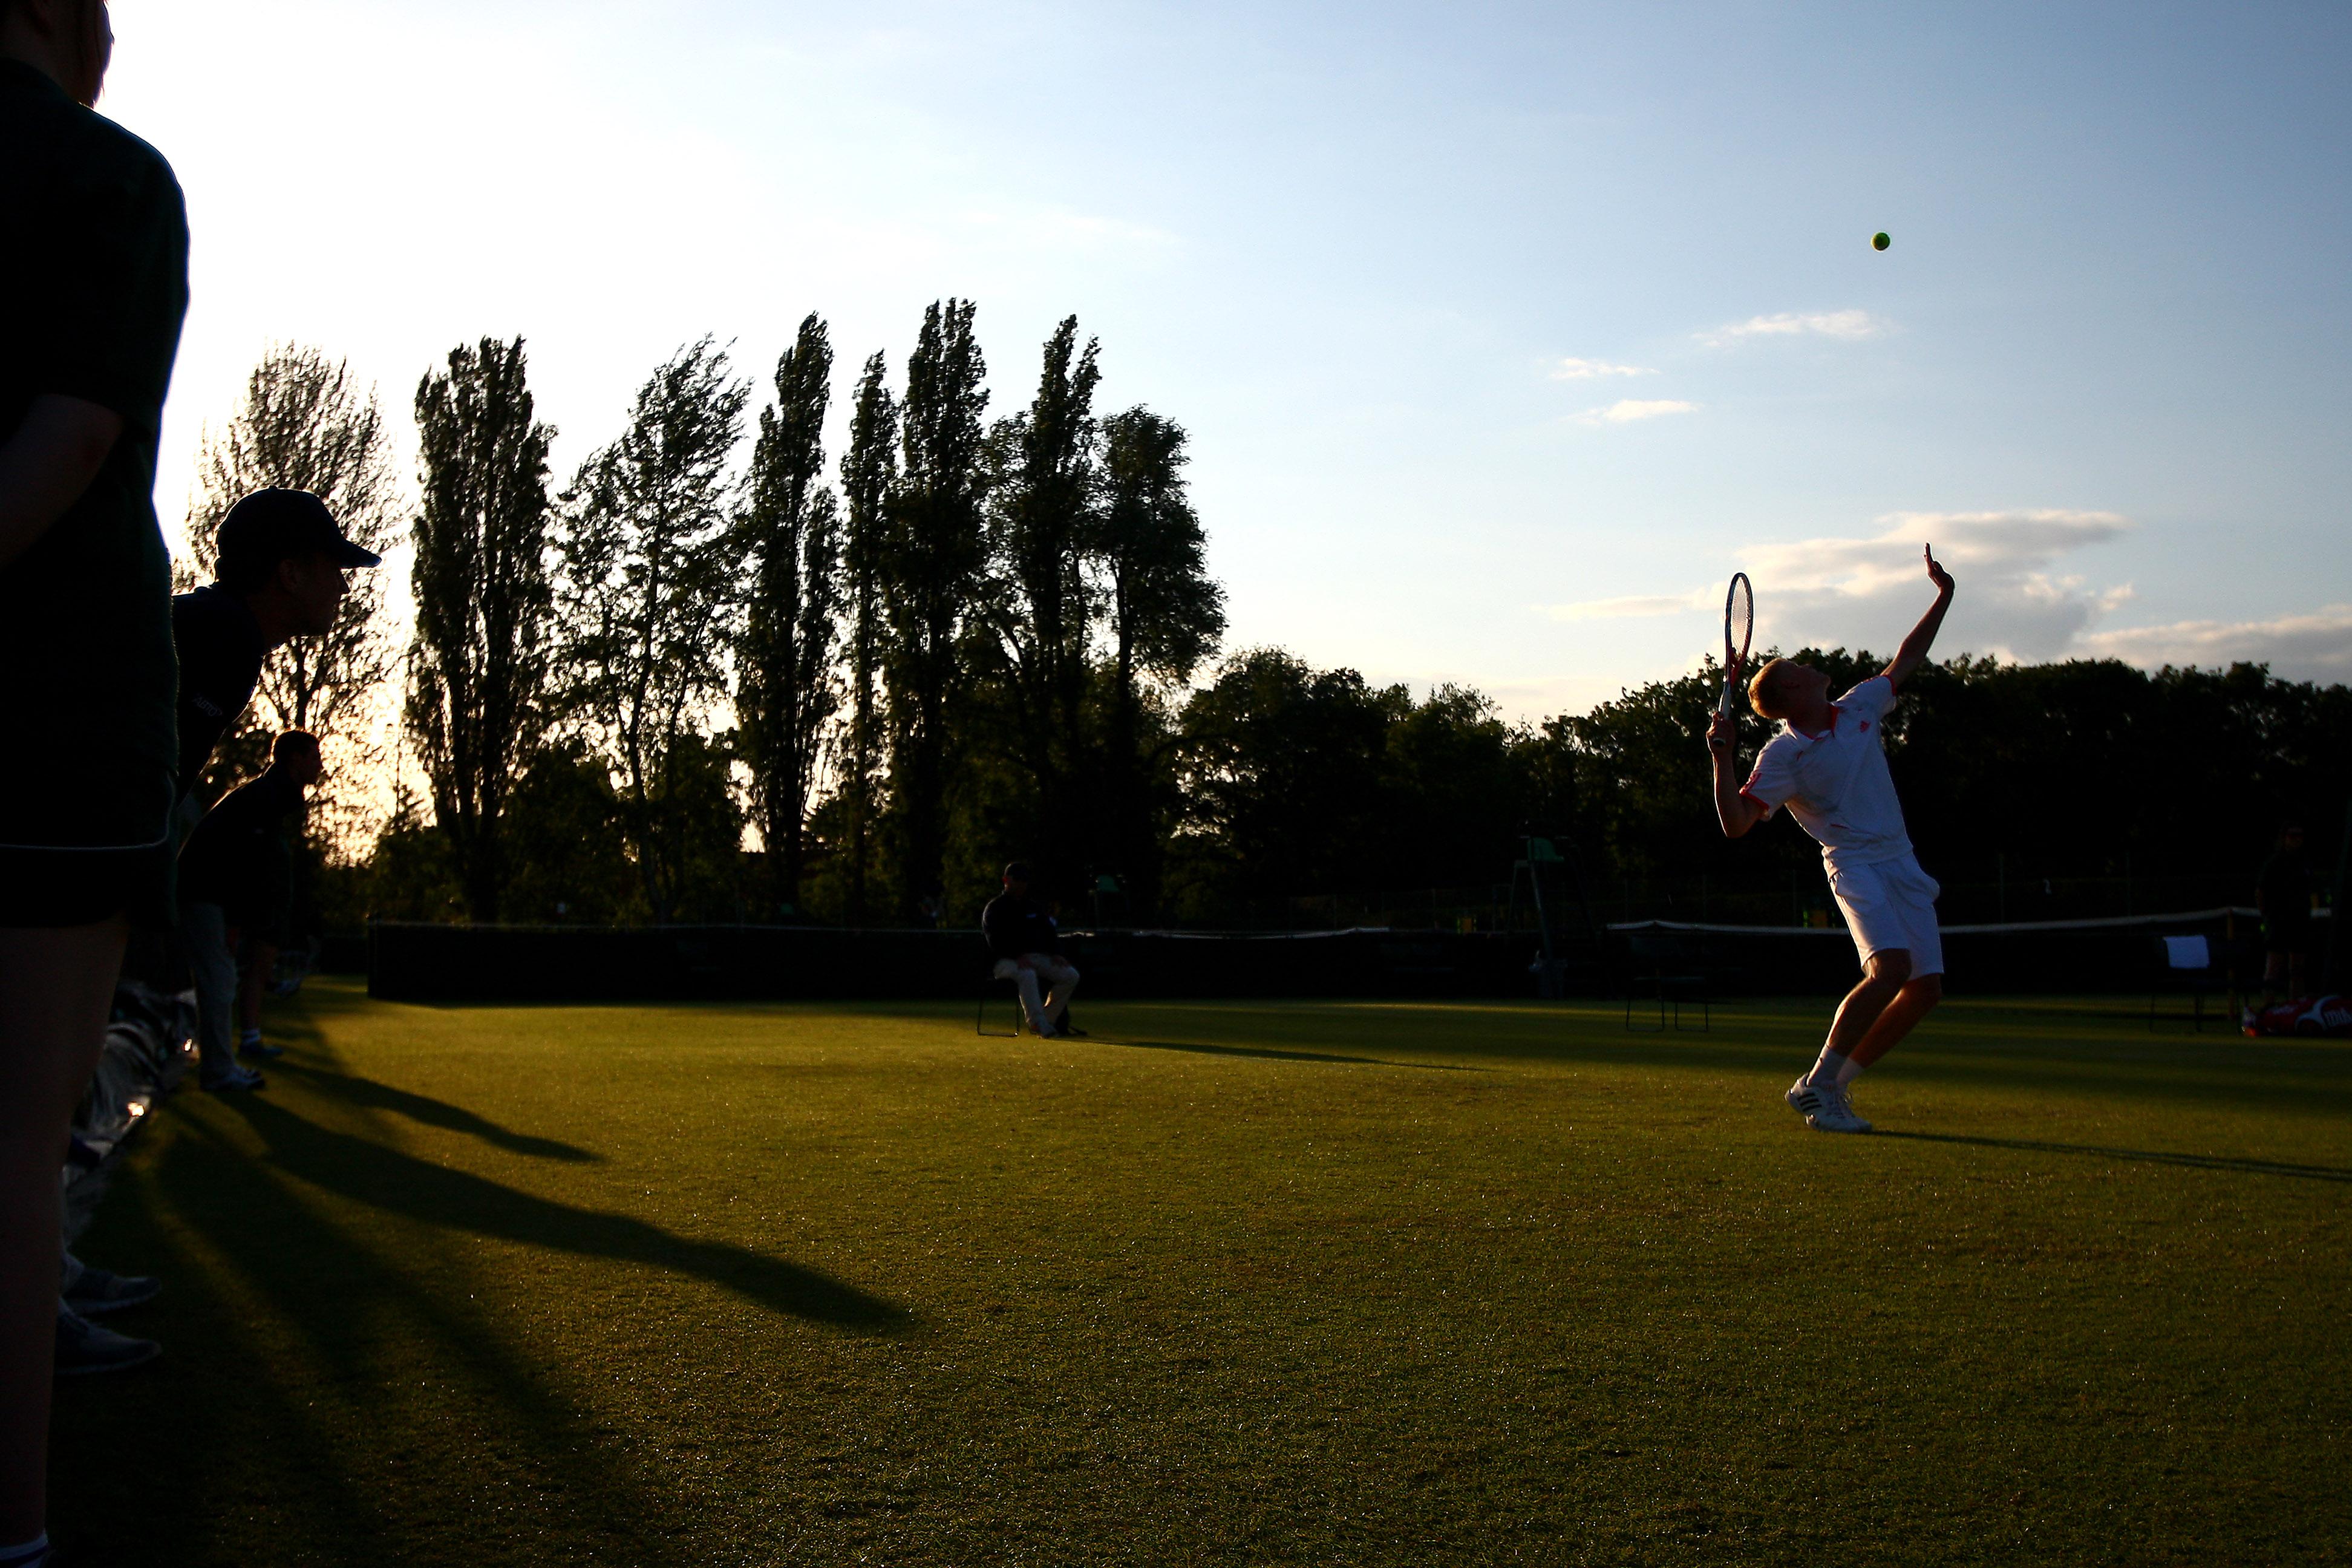 Qualifikation in Wimbledon